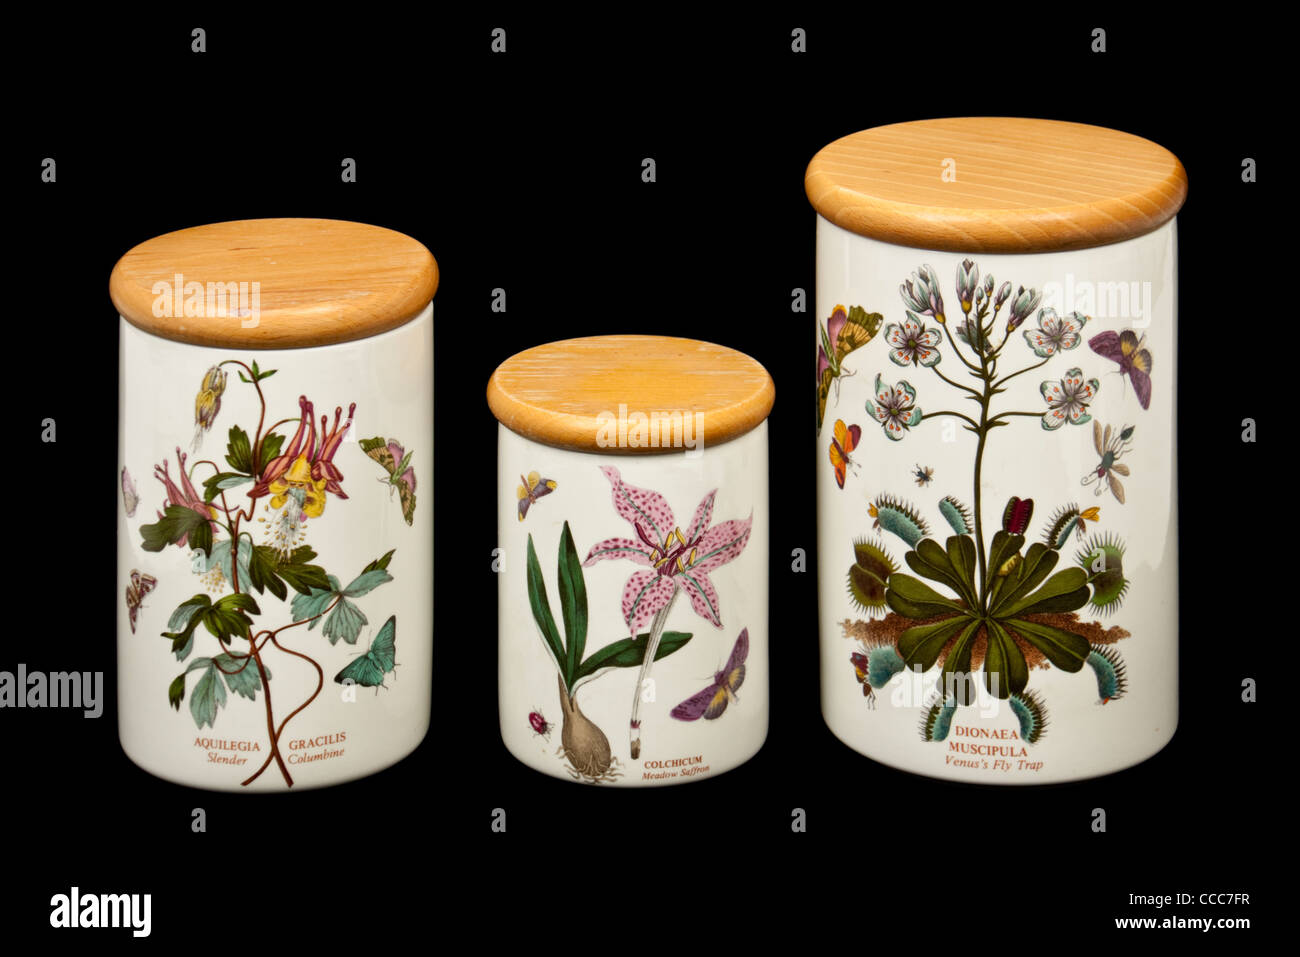 Set of three Portmeirion Botanic Garden ceramic lidded storage